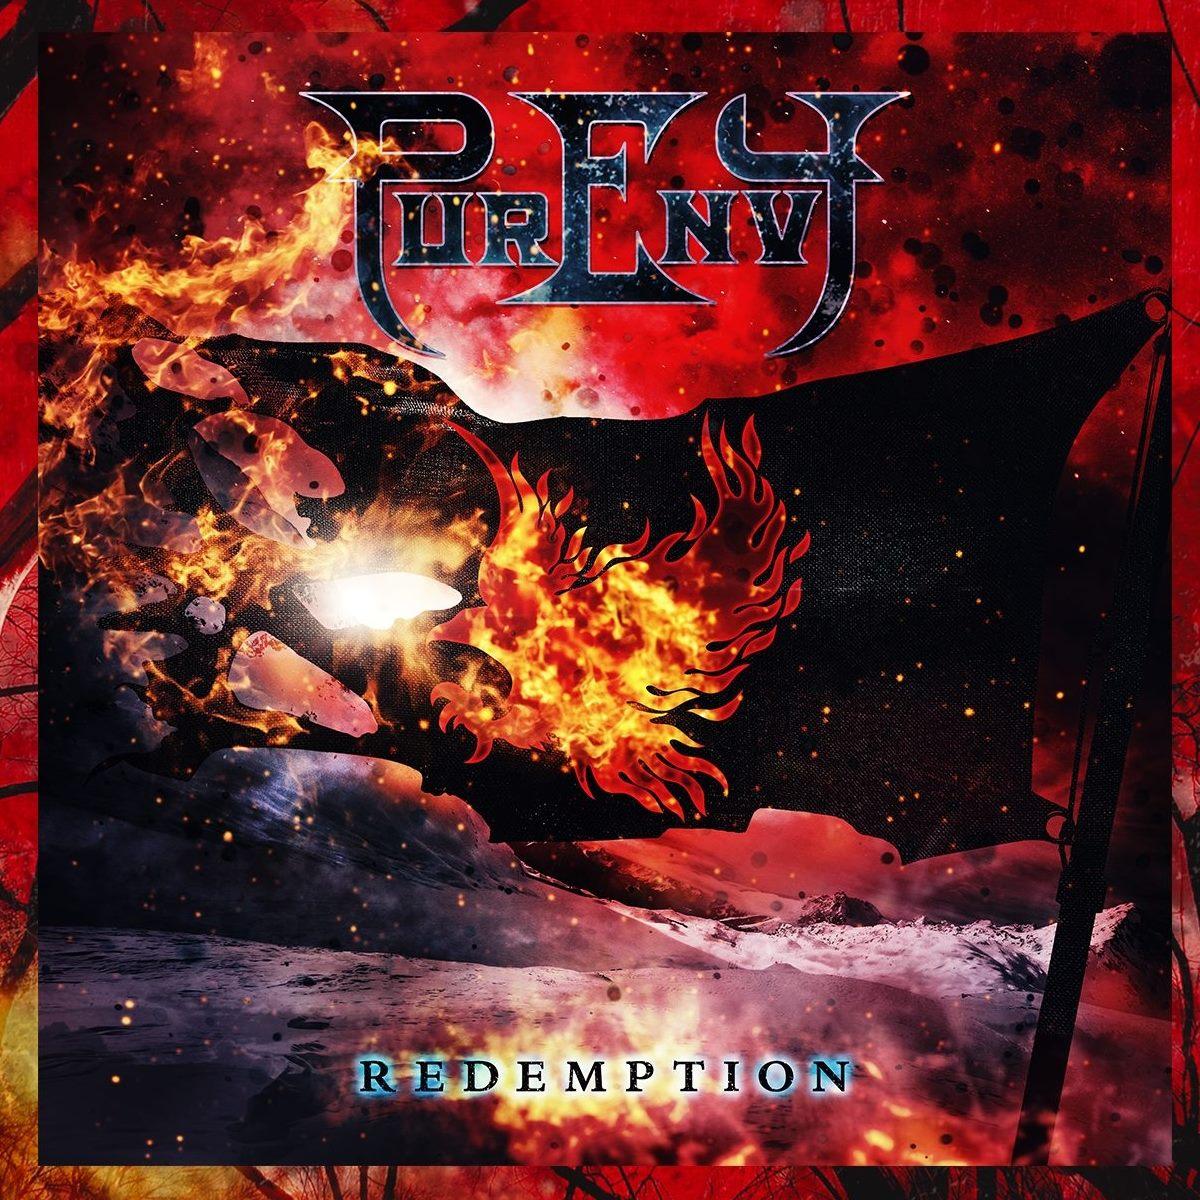 purenvy – redemption